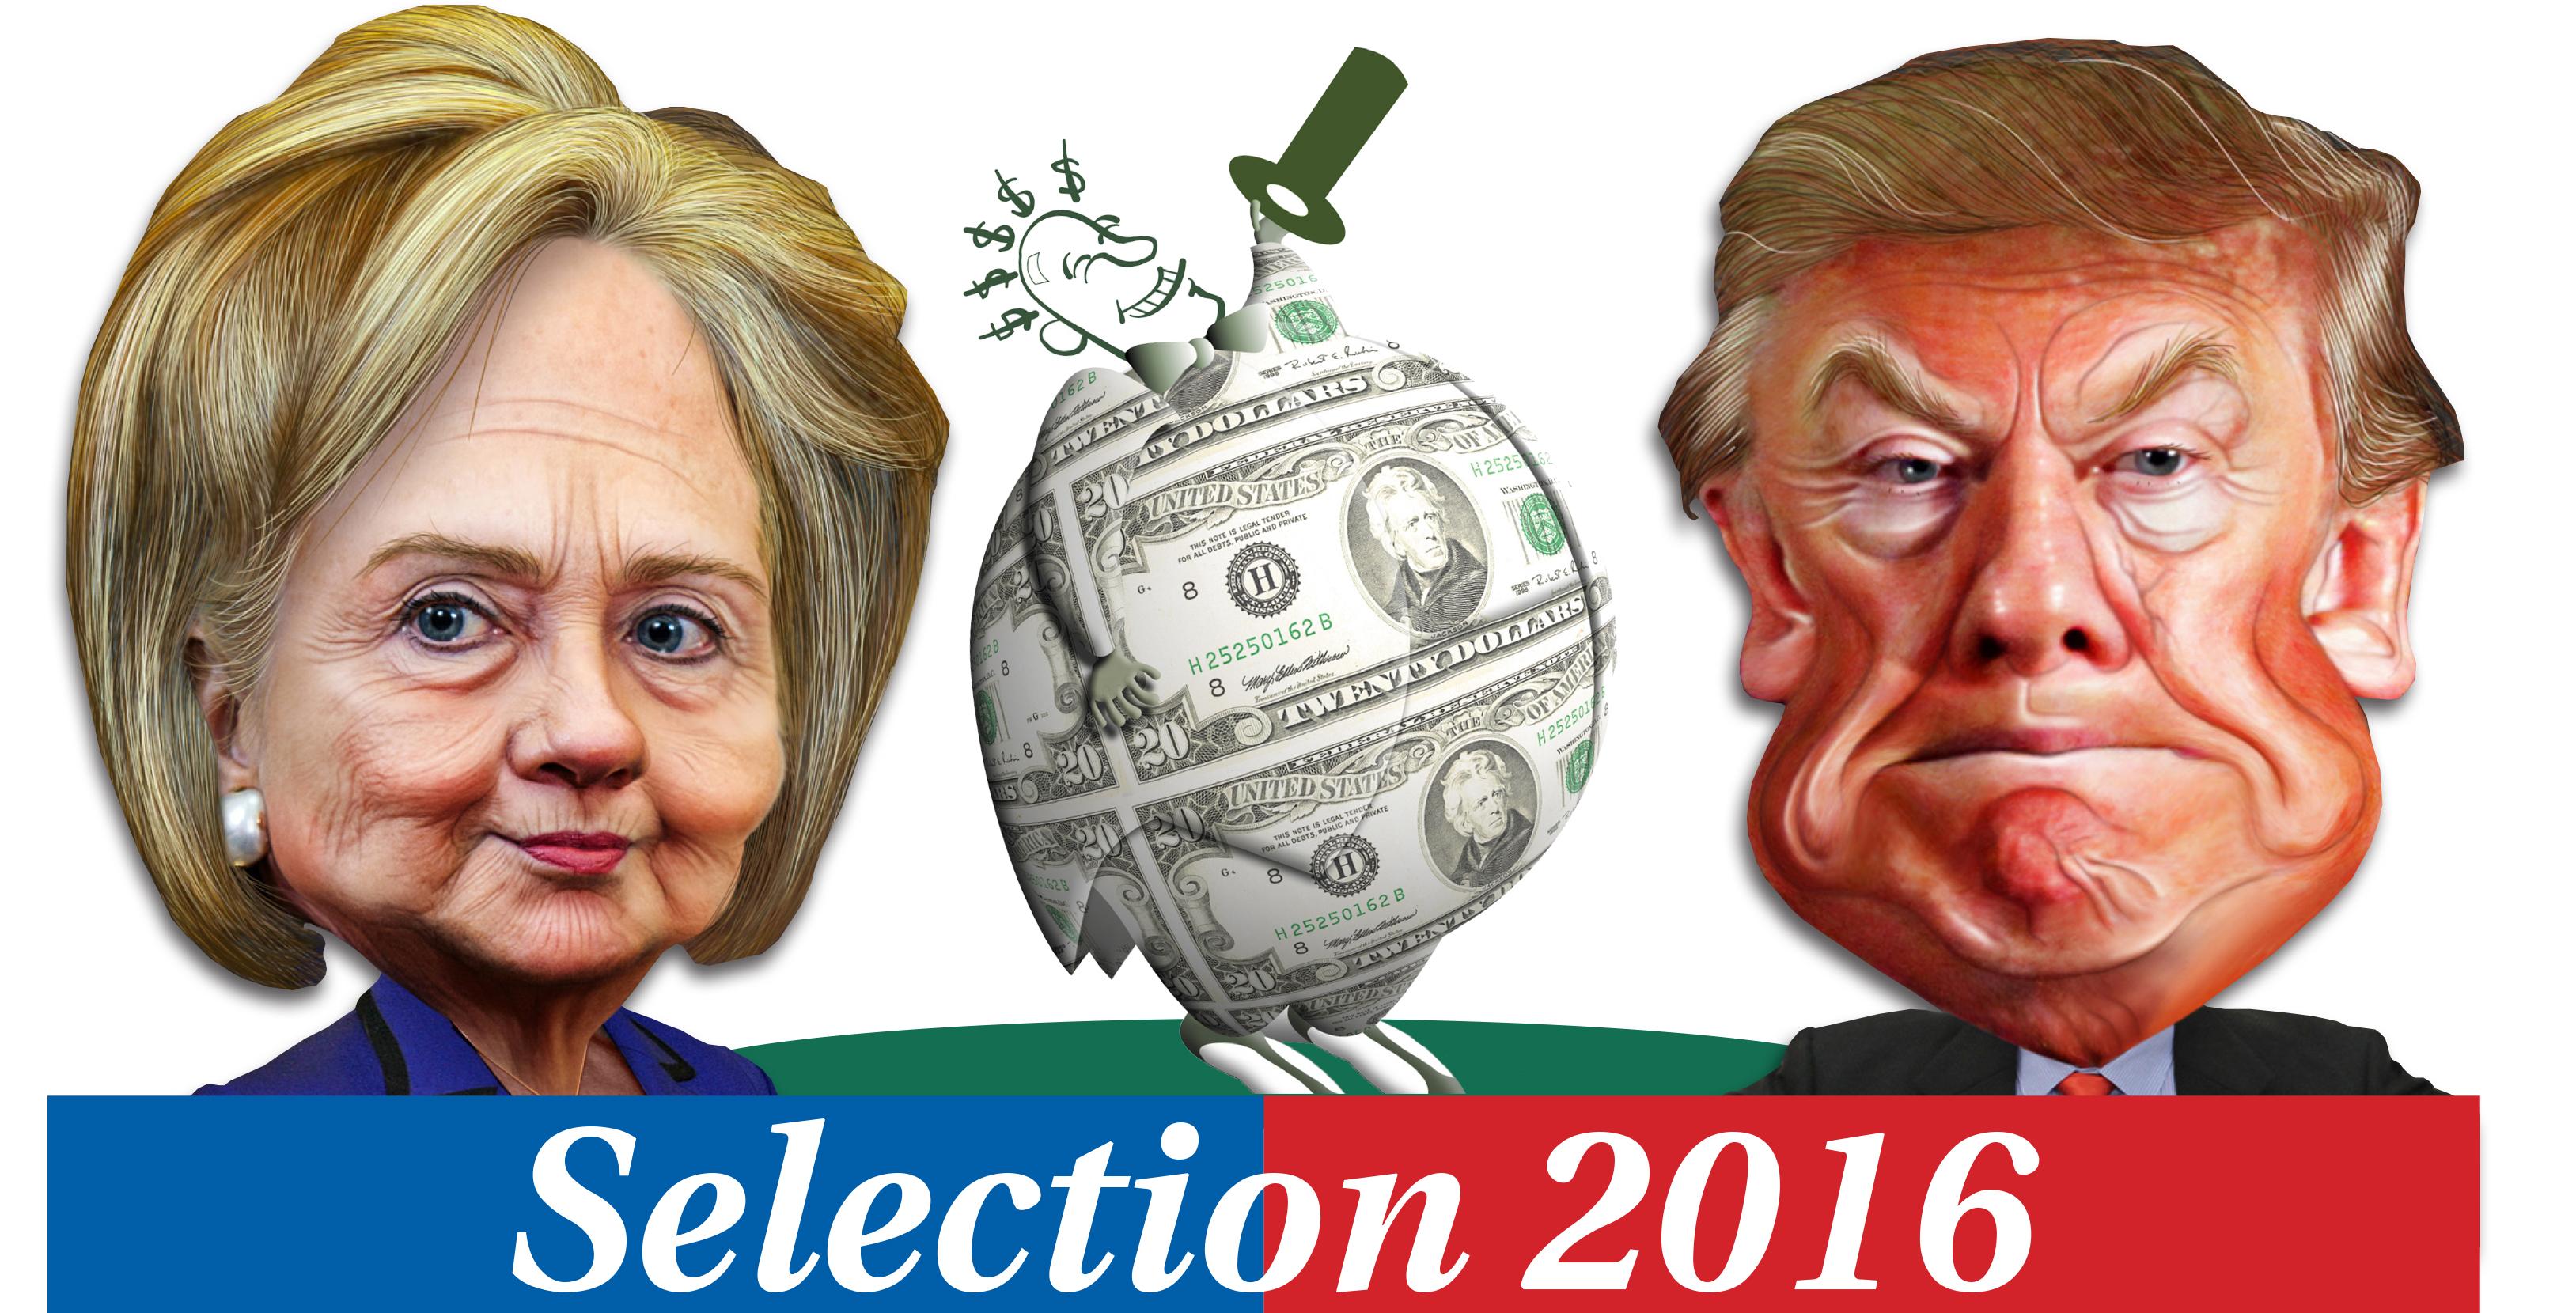 selection_2016.jpg